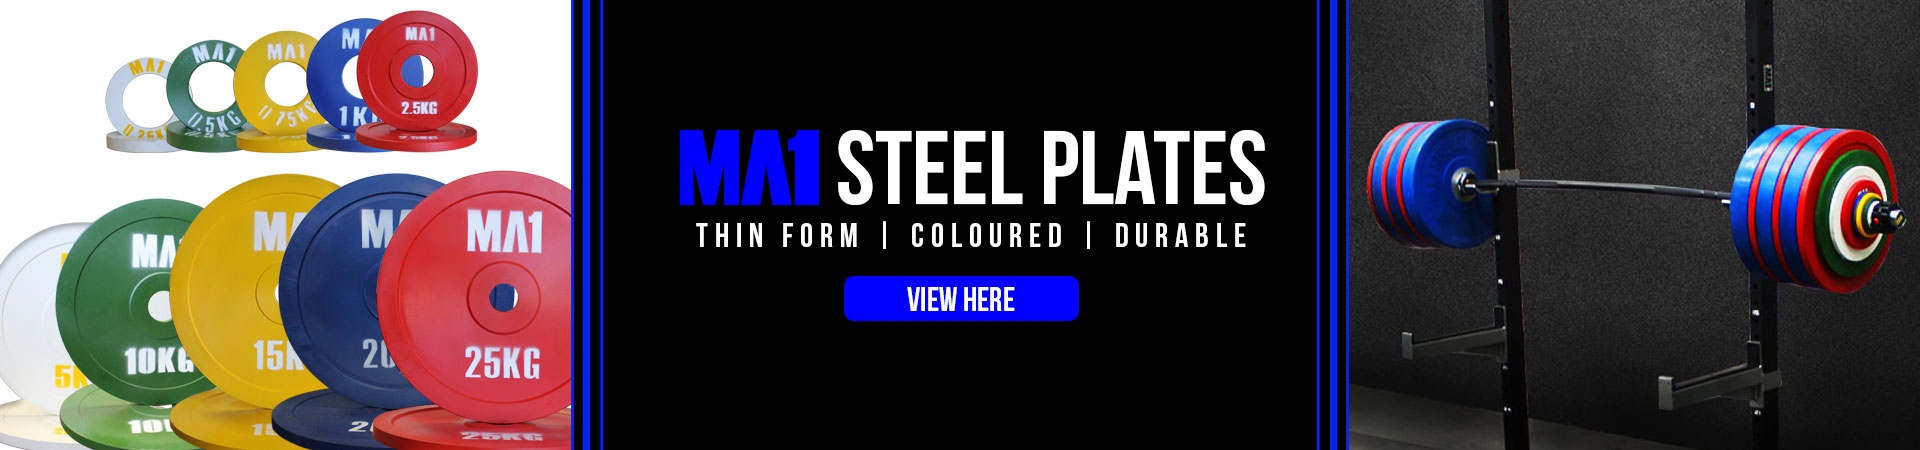 MA1 Pro Steel Olympic Plates